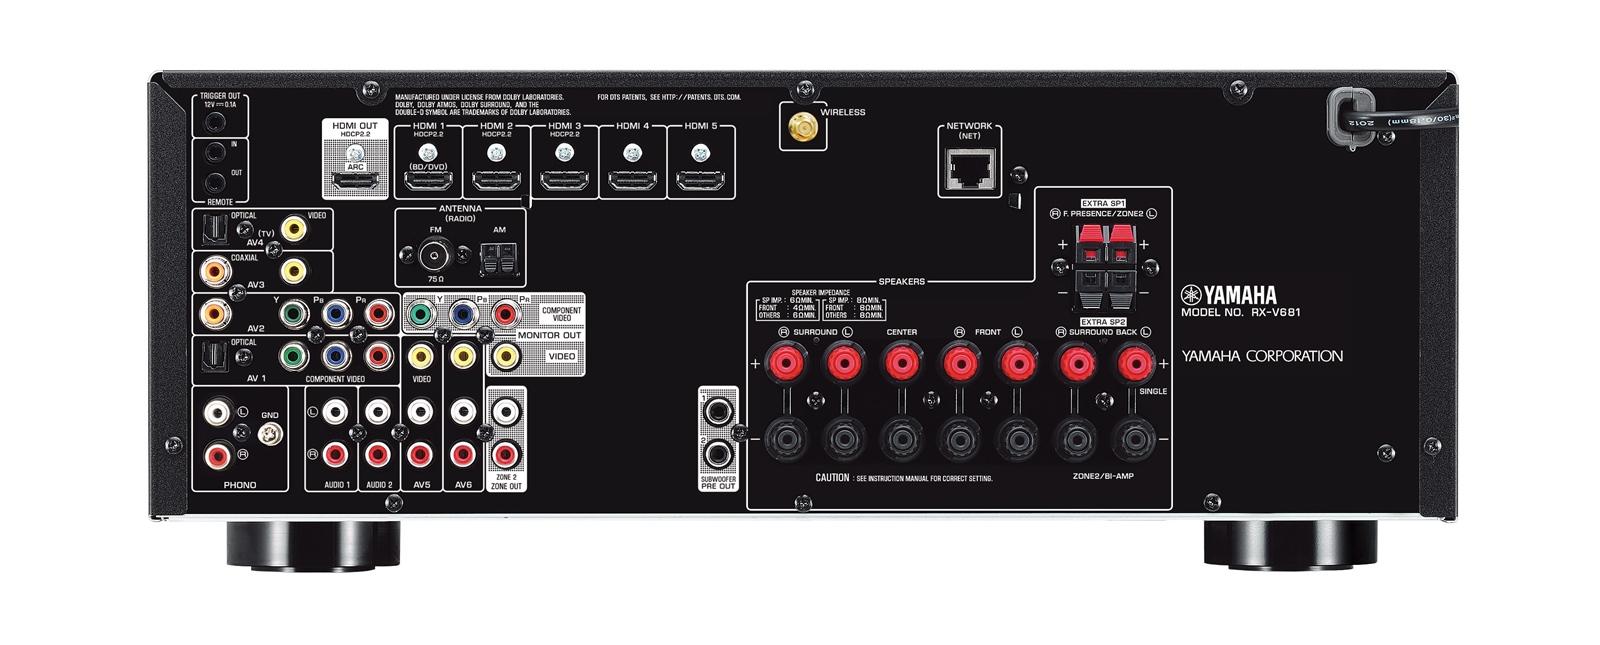 Yamaha Rx V  Hdmi Control